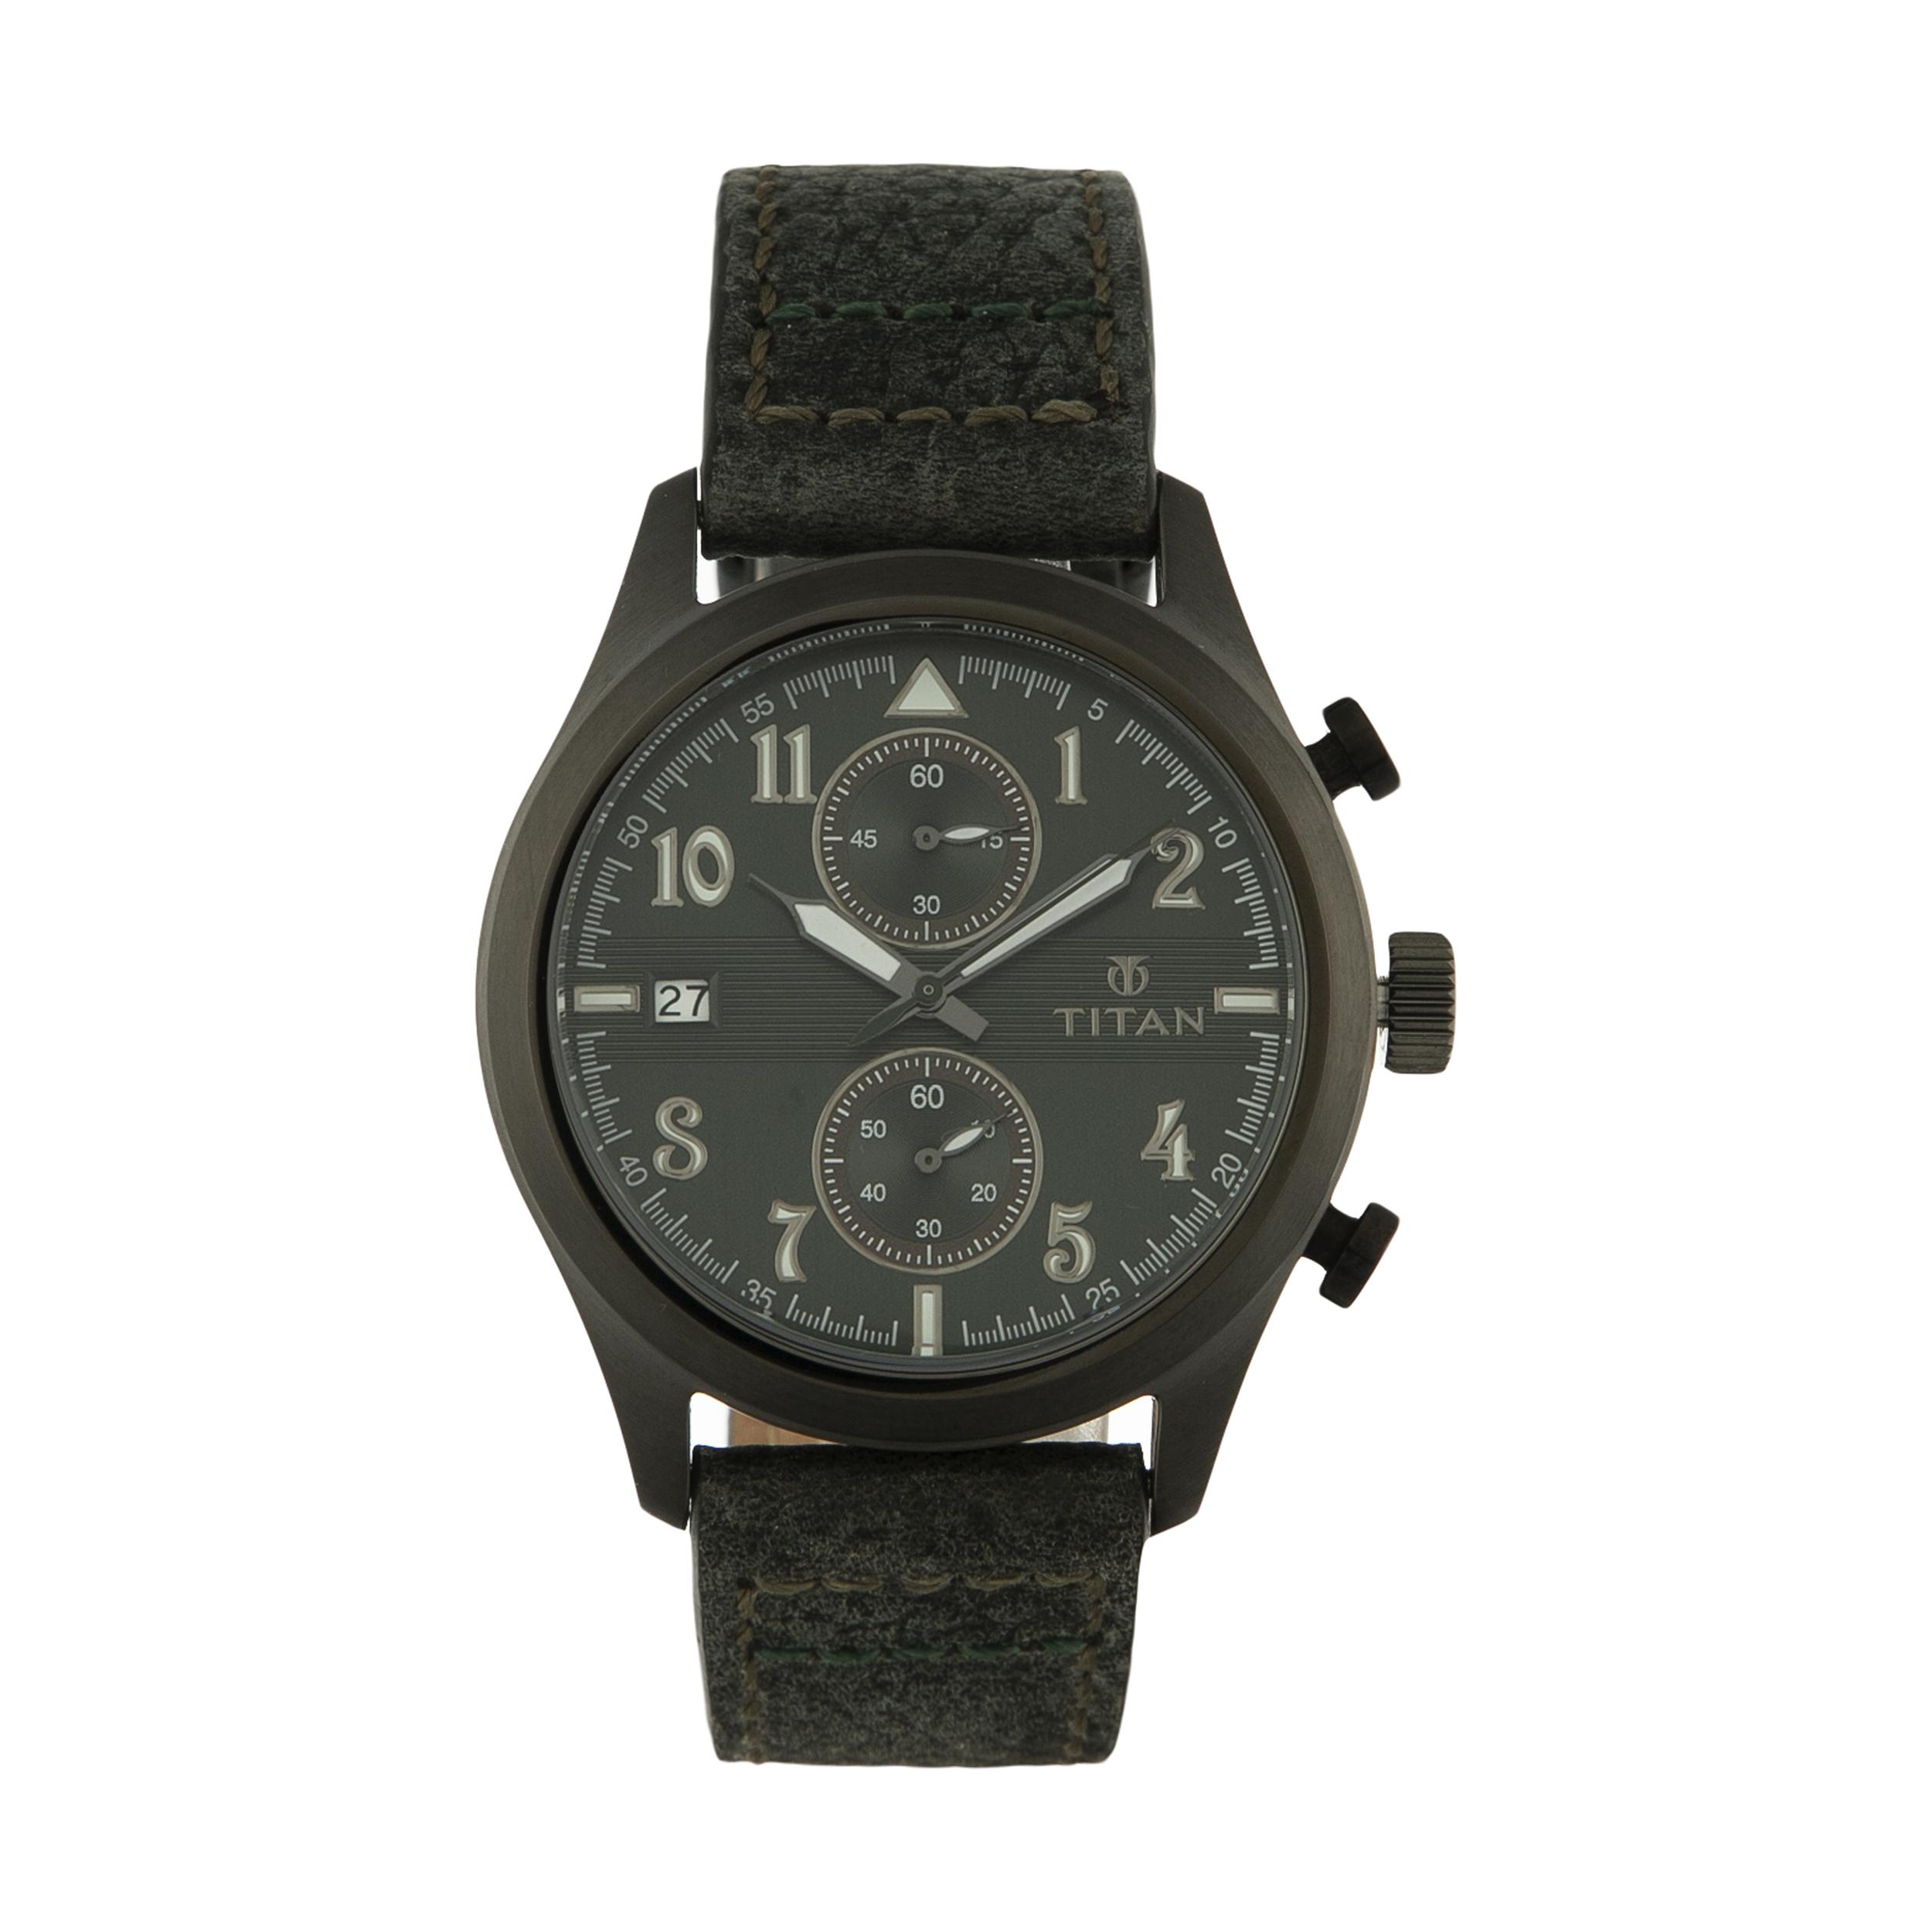 ساعت مچی عقربه ای مردانه تیتان مدل T90052QL02